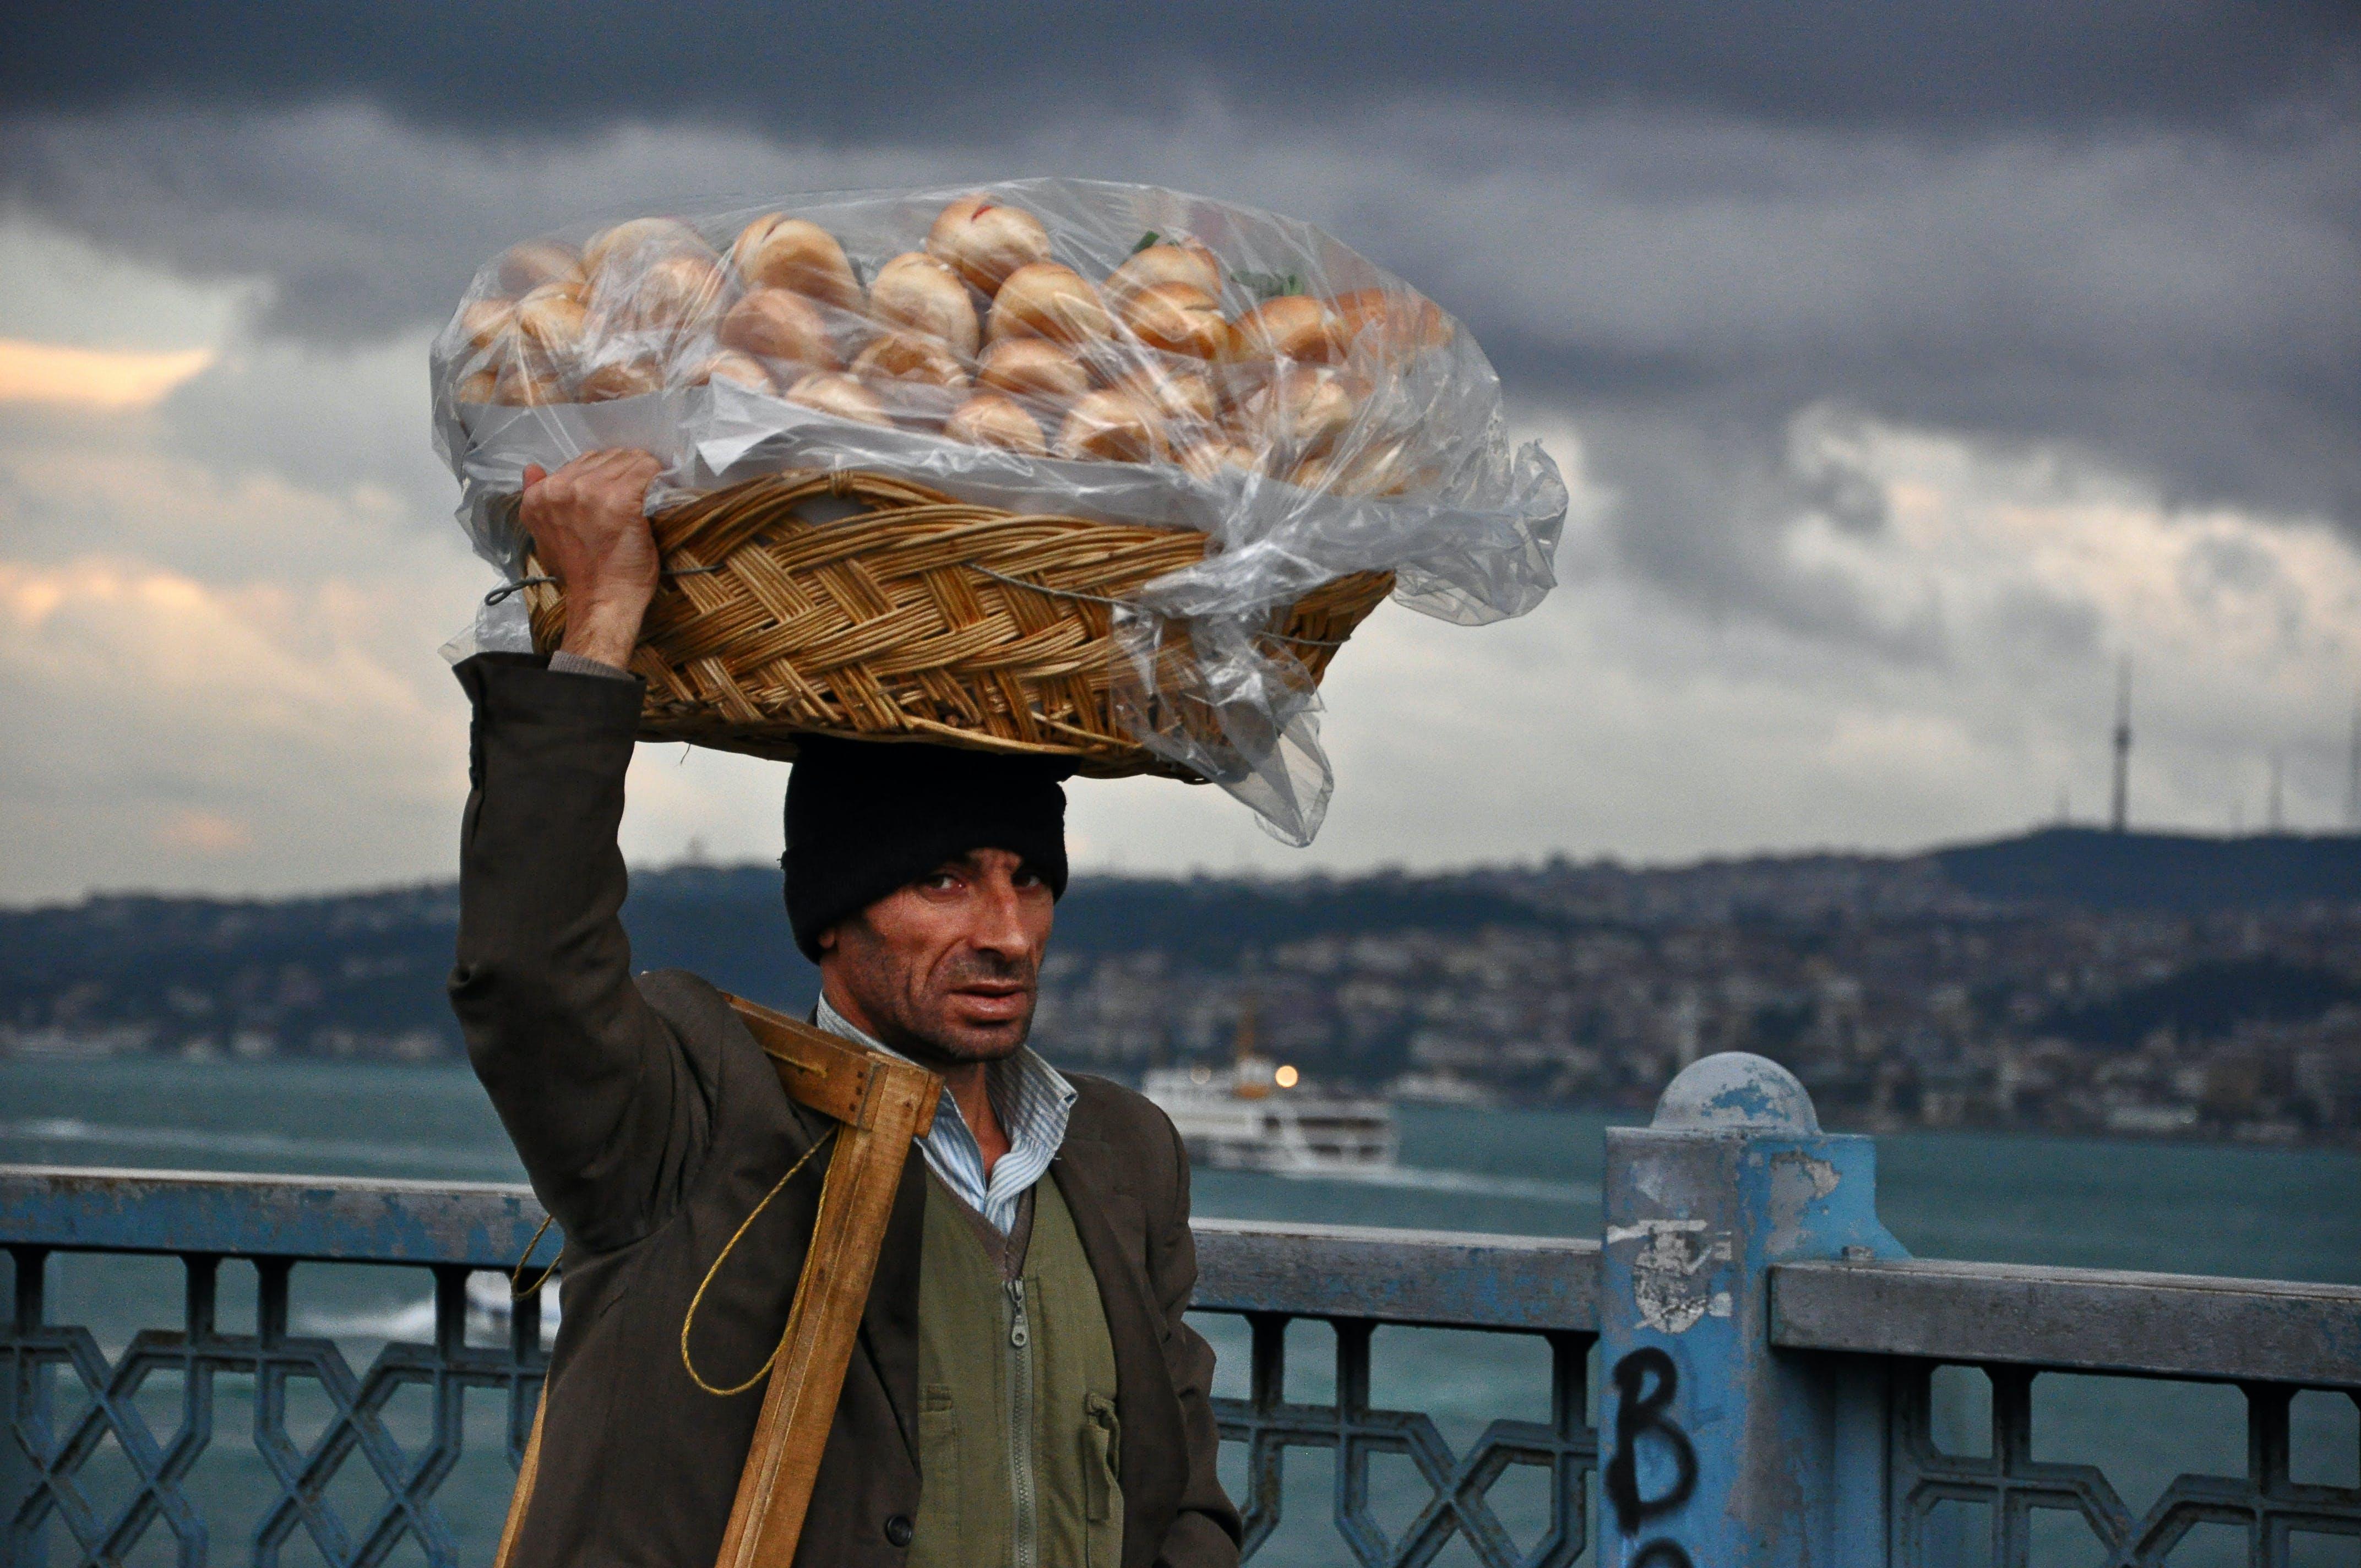 Basket on Man's Head Under Cloudy Sky